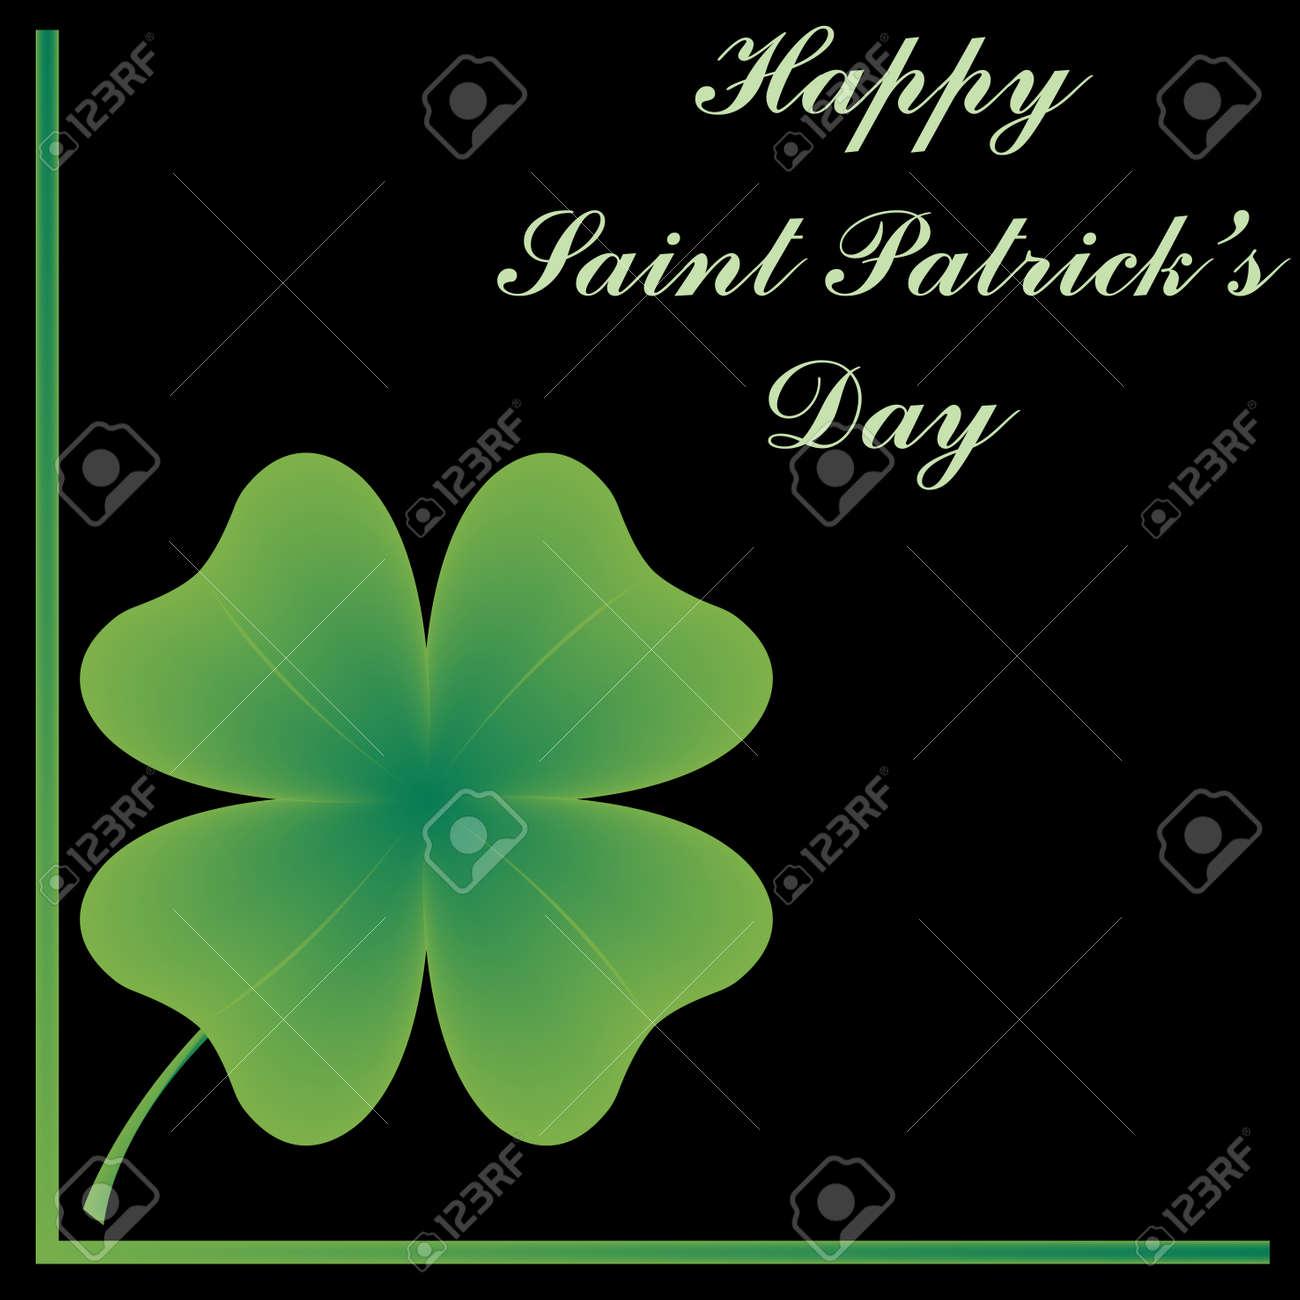 happy saint patrick's day, abstract art illustration Stock Vector - 6409777